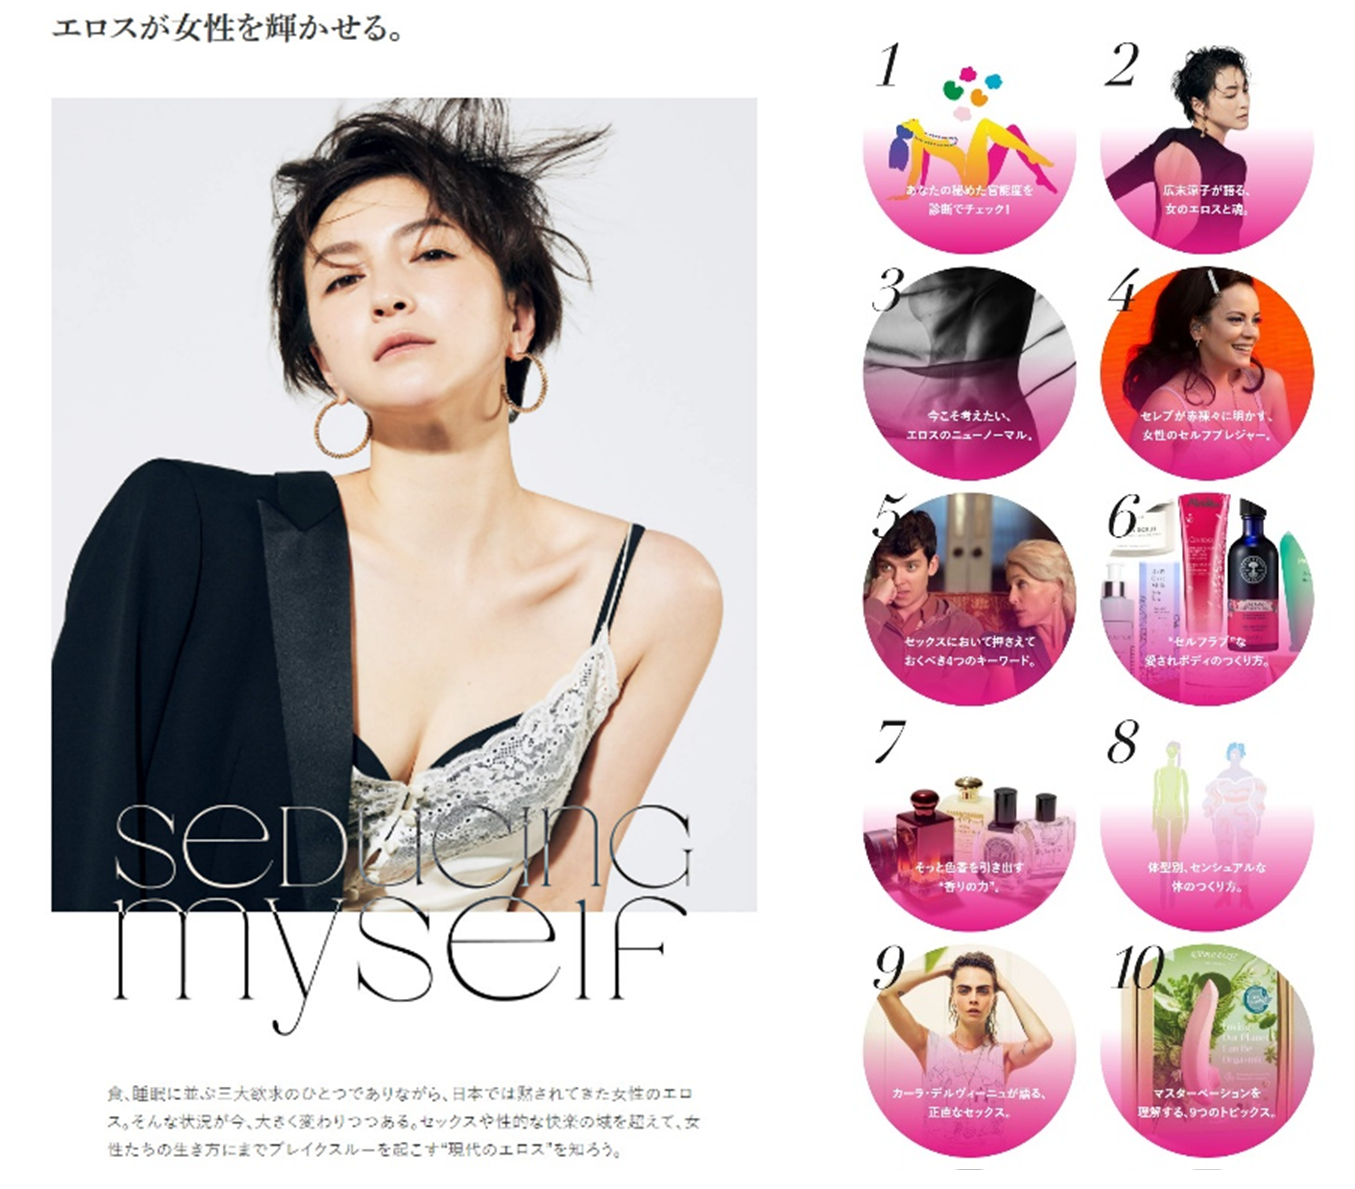 『VOGUE JAPAN』WEBSITE (C) 2021 Conde Nast Japan. All rights reserved.